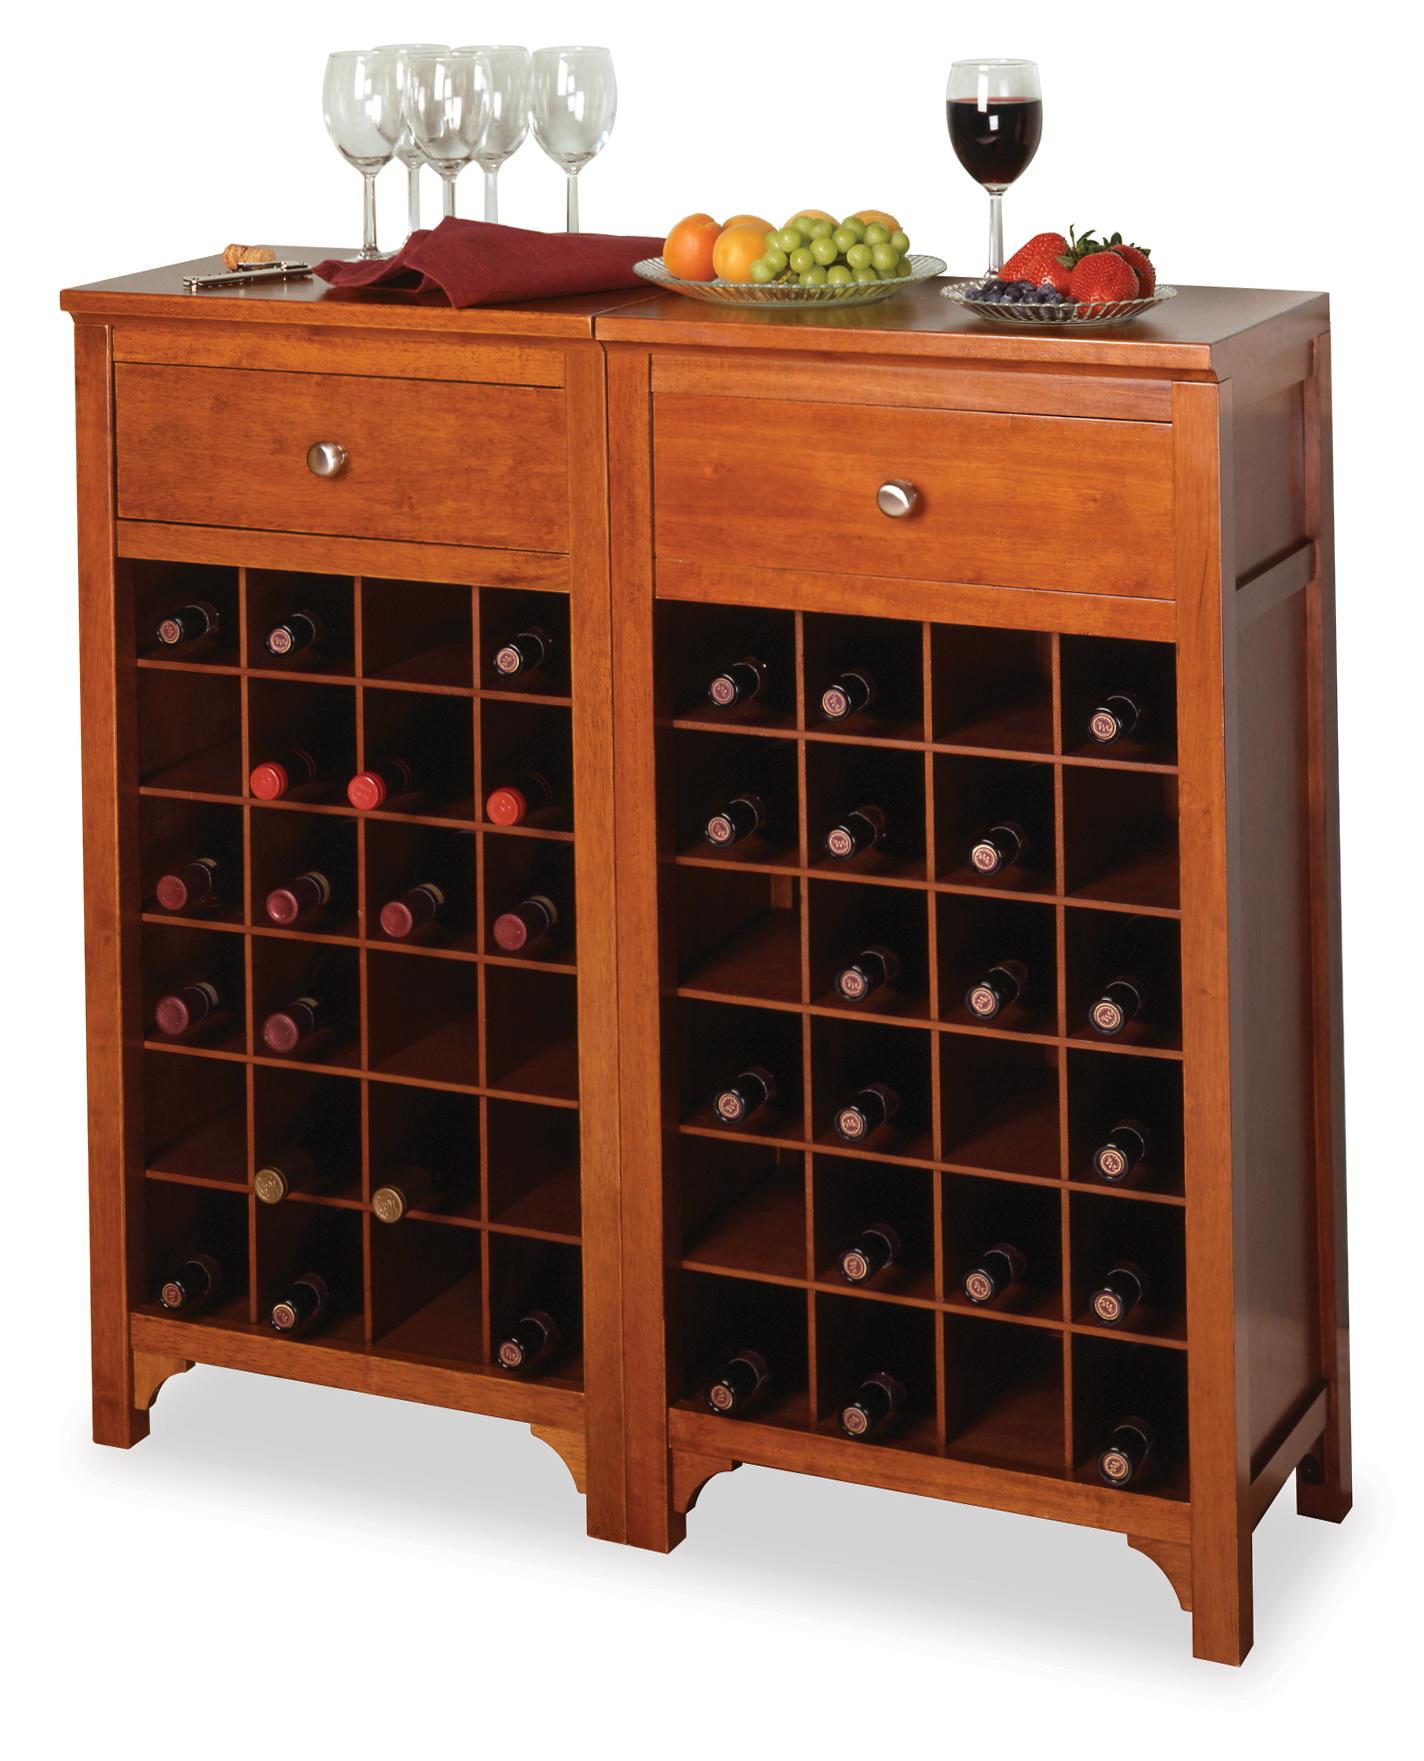 Wine Rack Cabinet Insert | Home Design Ideas